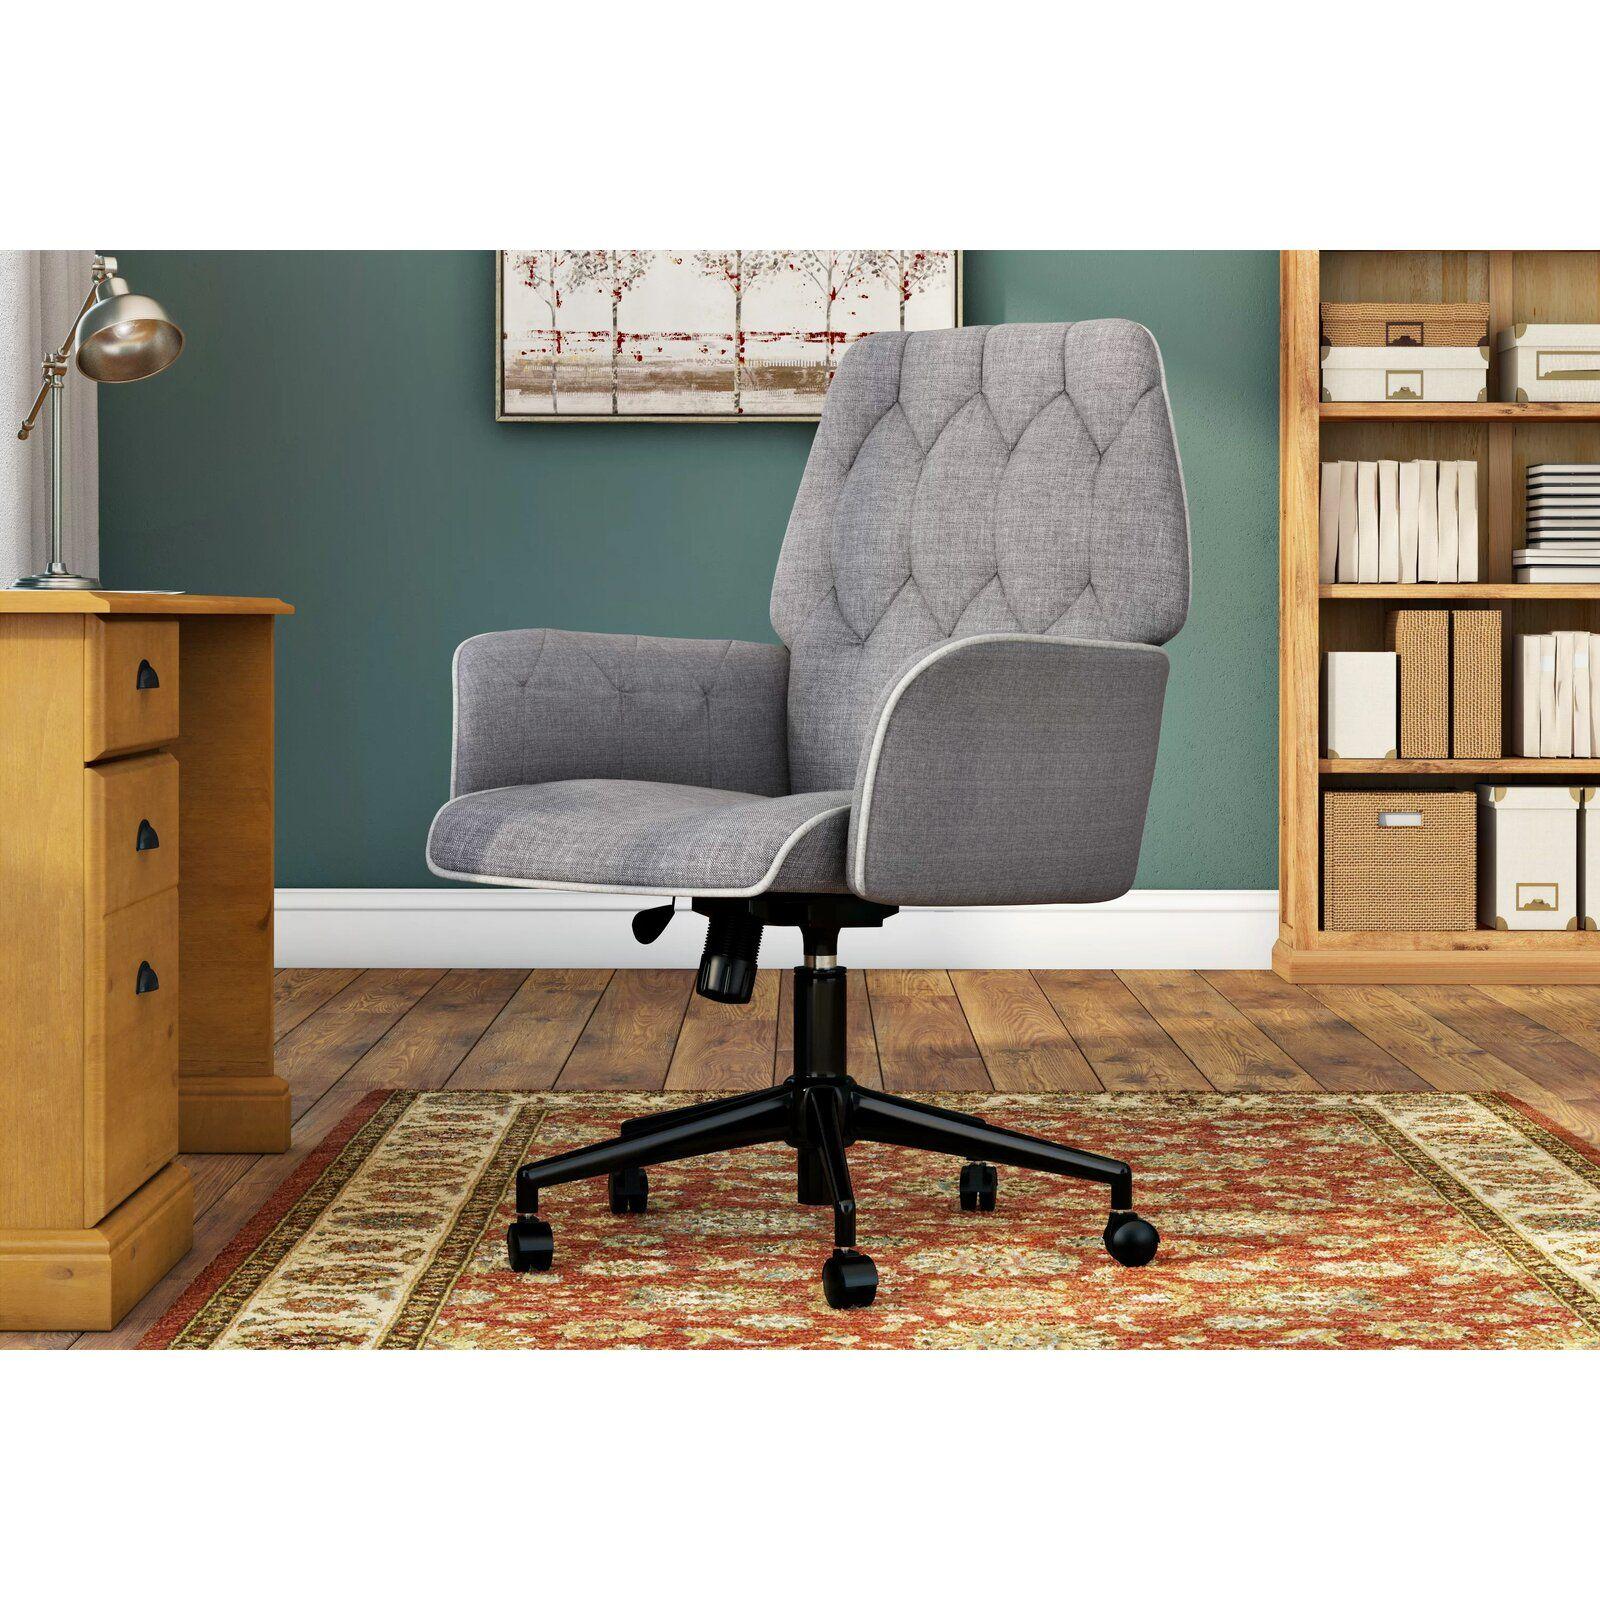 Meka Linen Swivel Executive Chair Vintage office chair